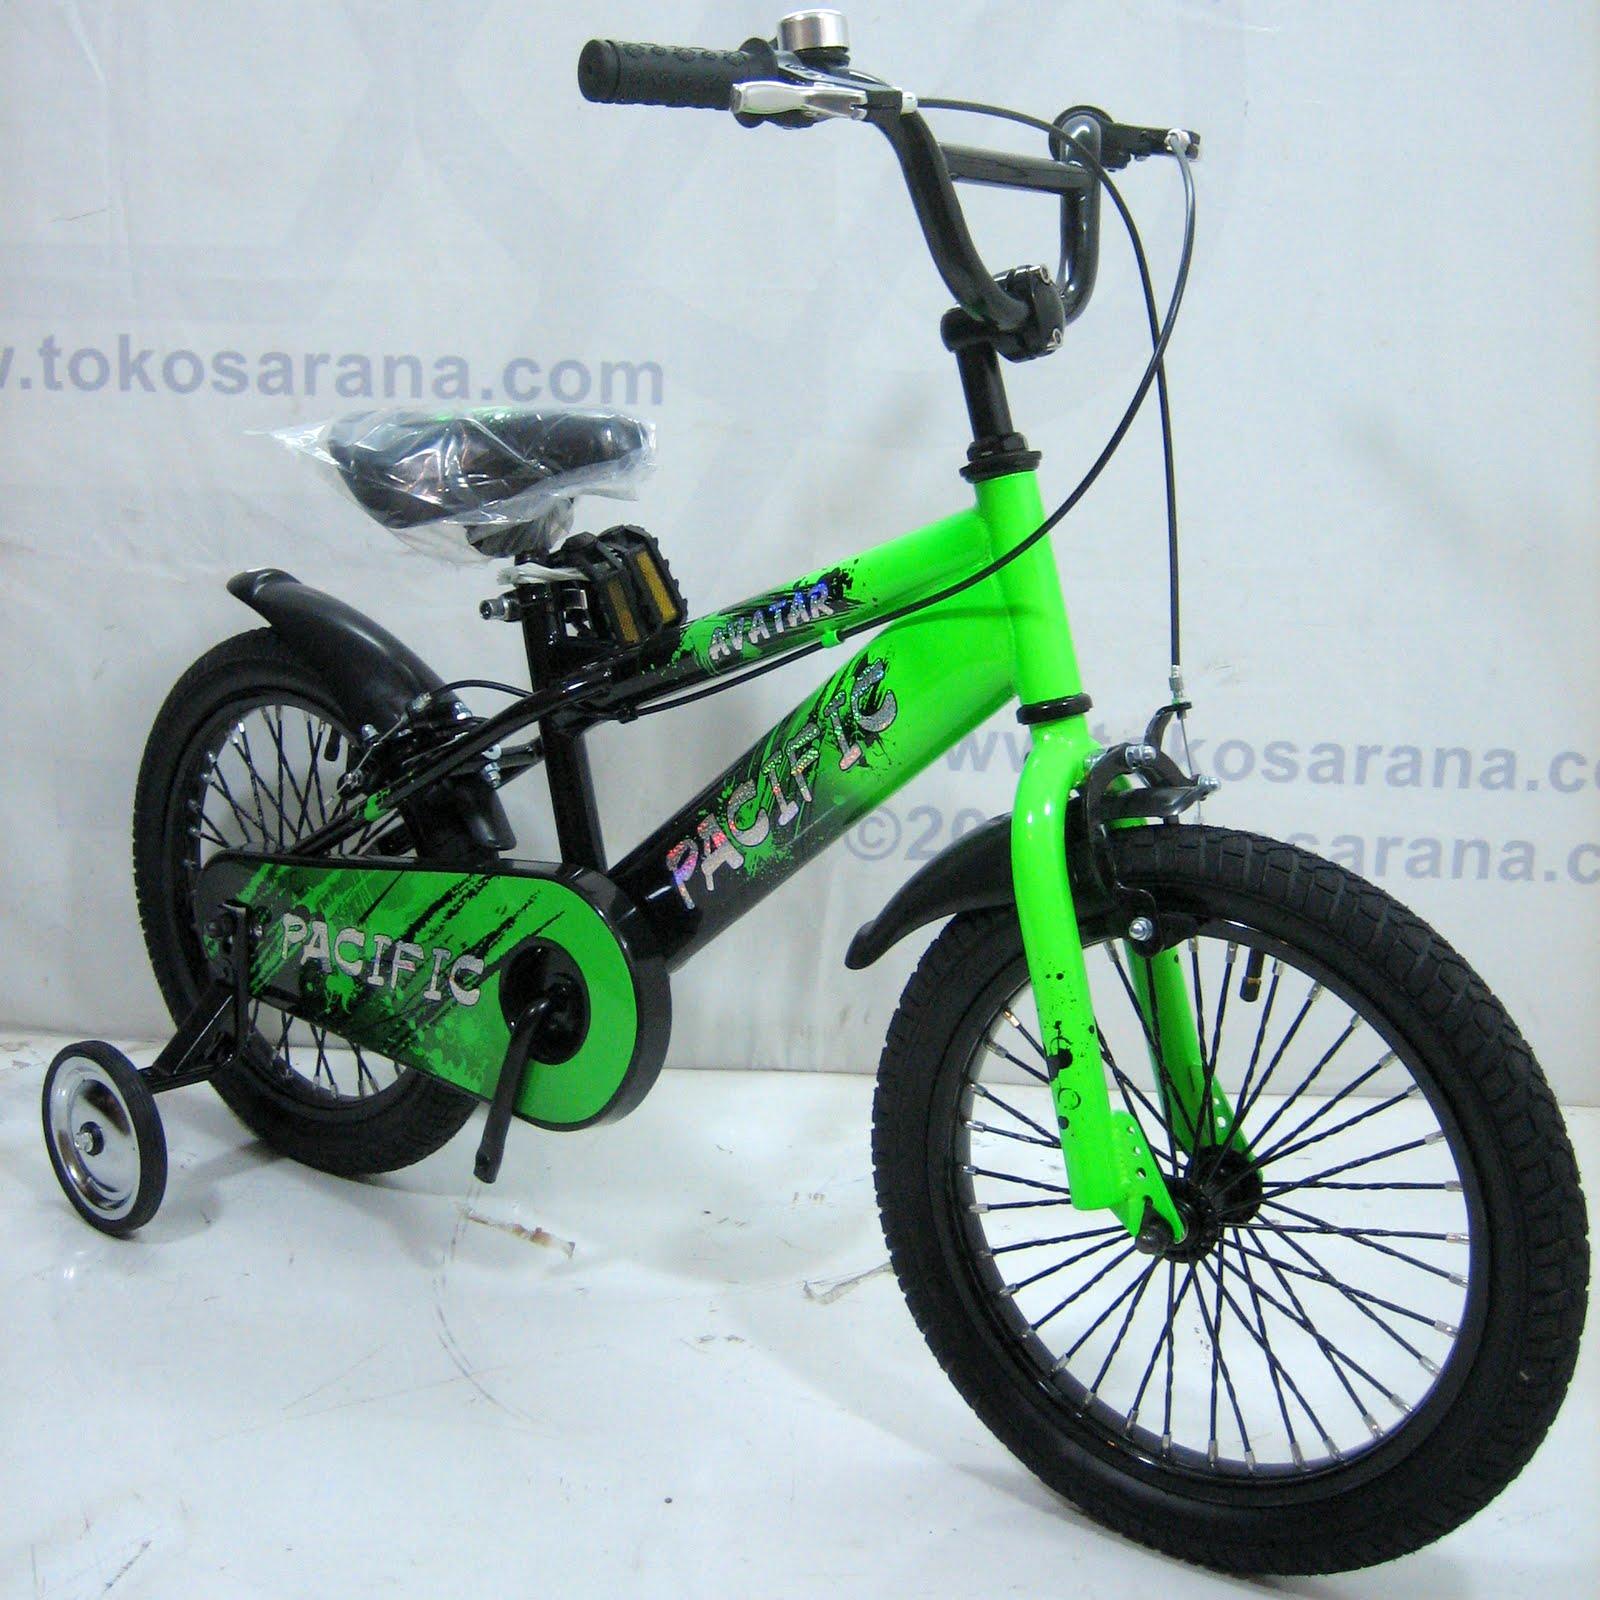 TokosaranaTMJakarta Jatinegara Sepeda Anak Pacific Avatar